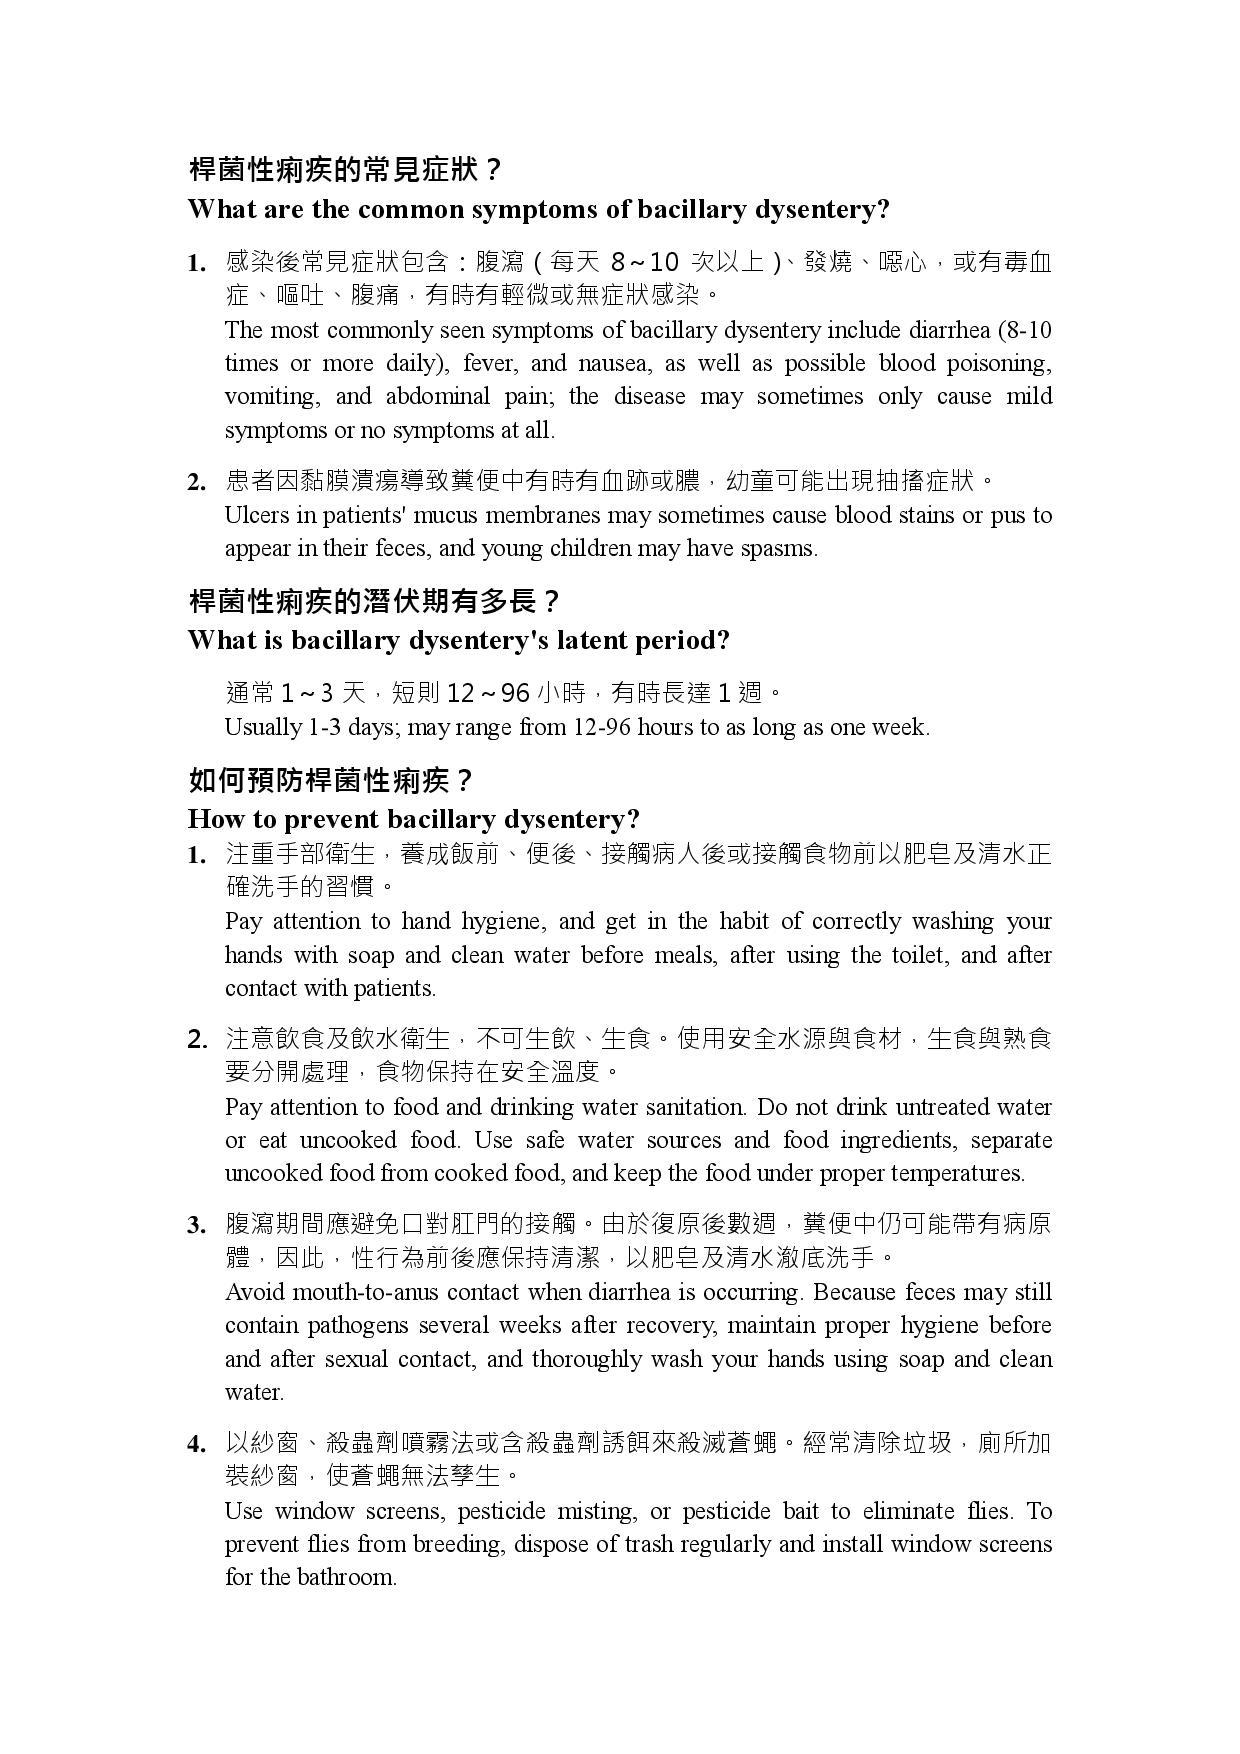 詳如附件【click me】To prevent bacillary dysentery(Page 2)預防桿菌性痢疾(英文)